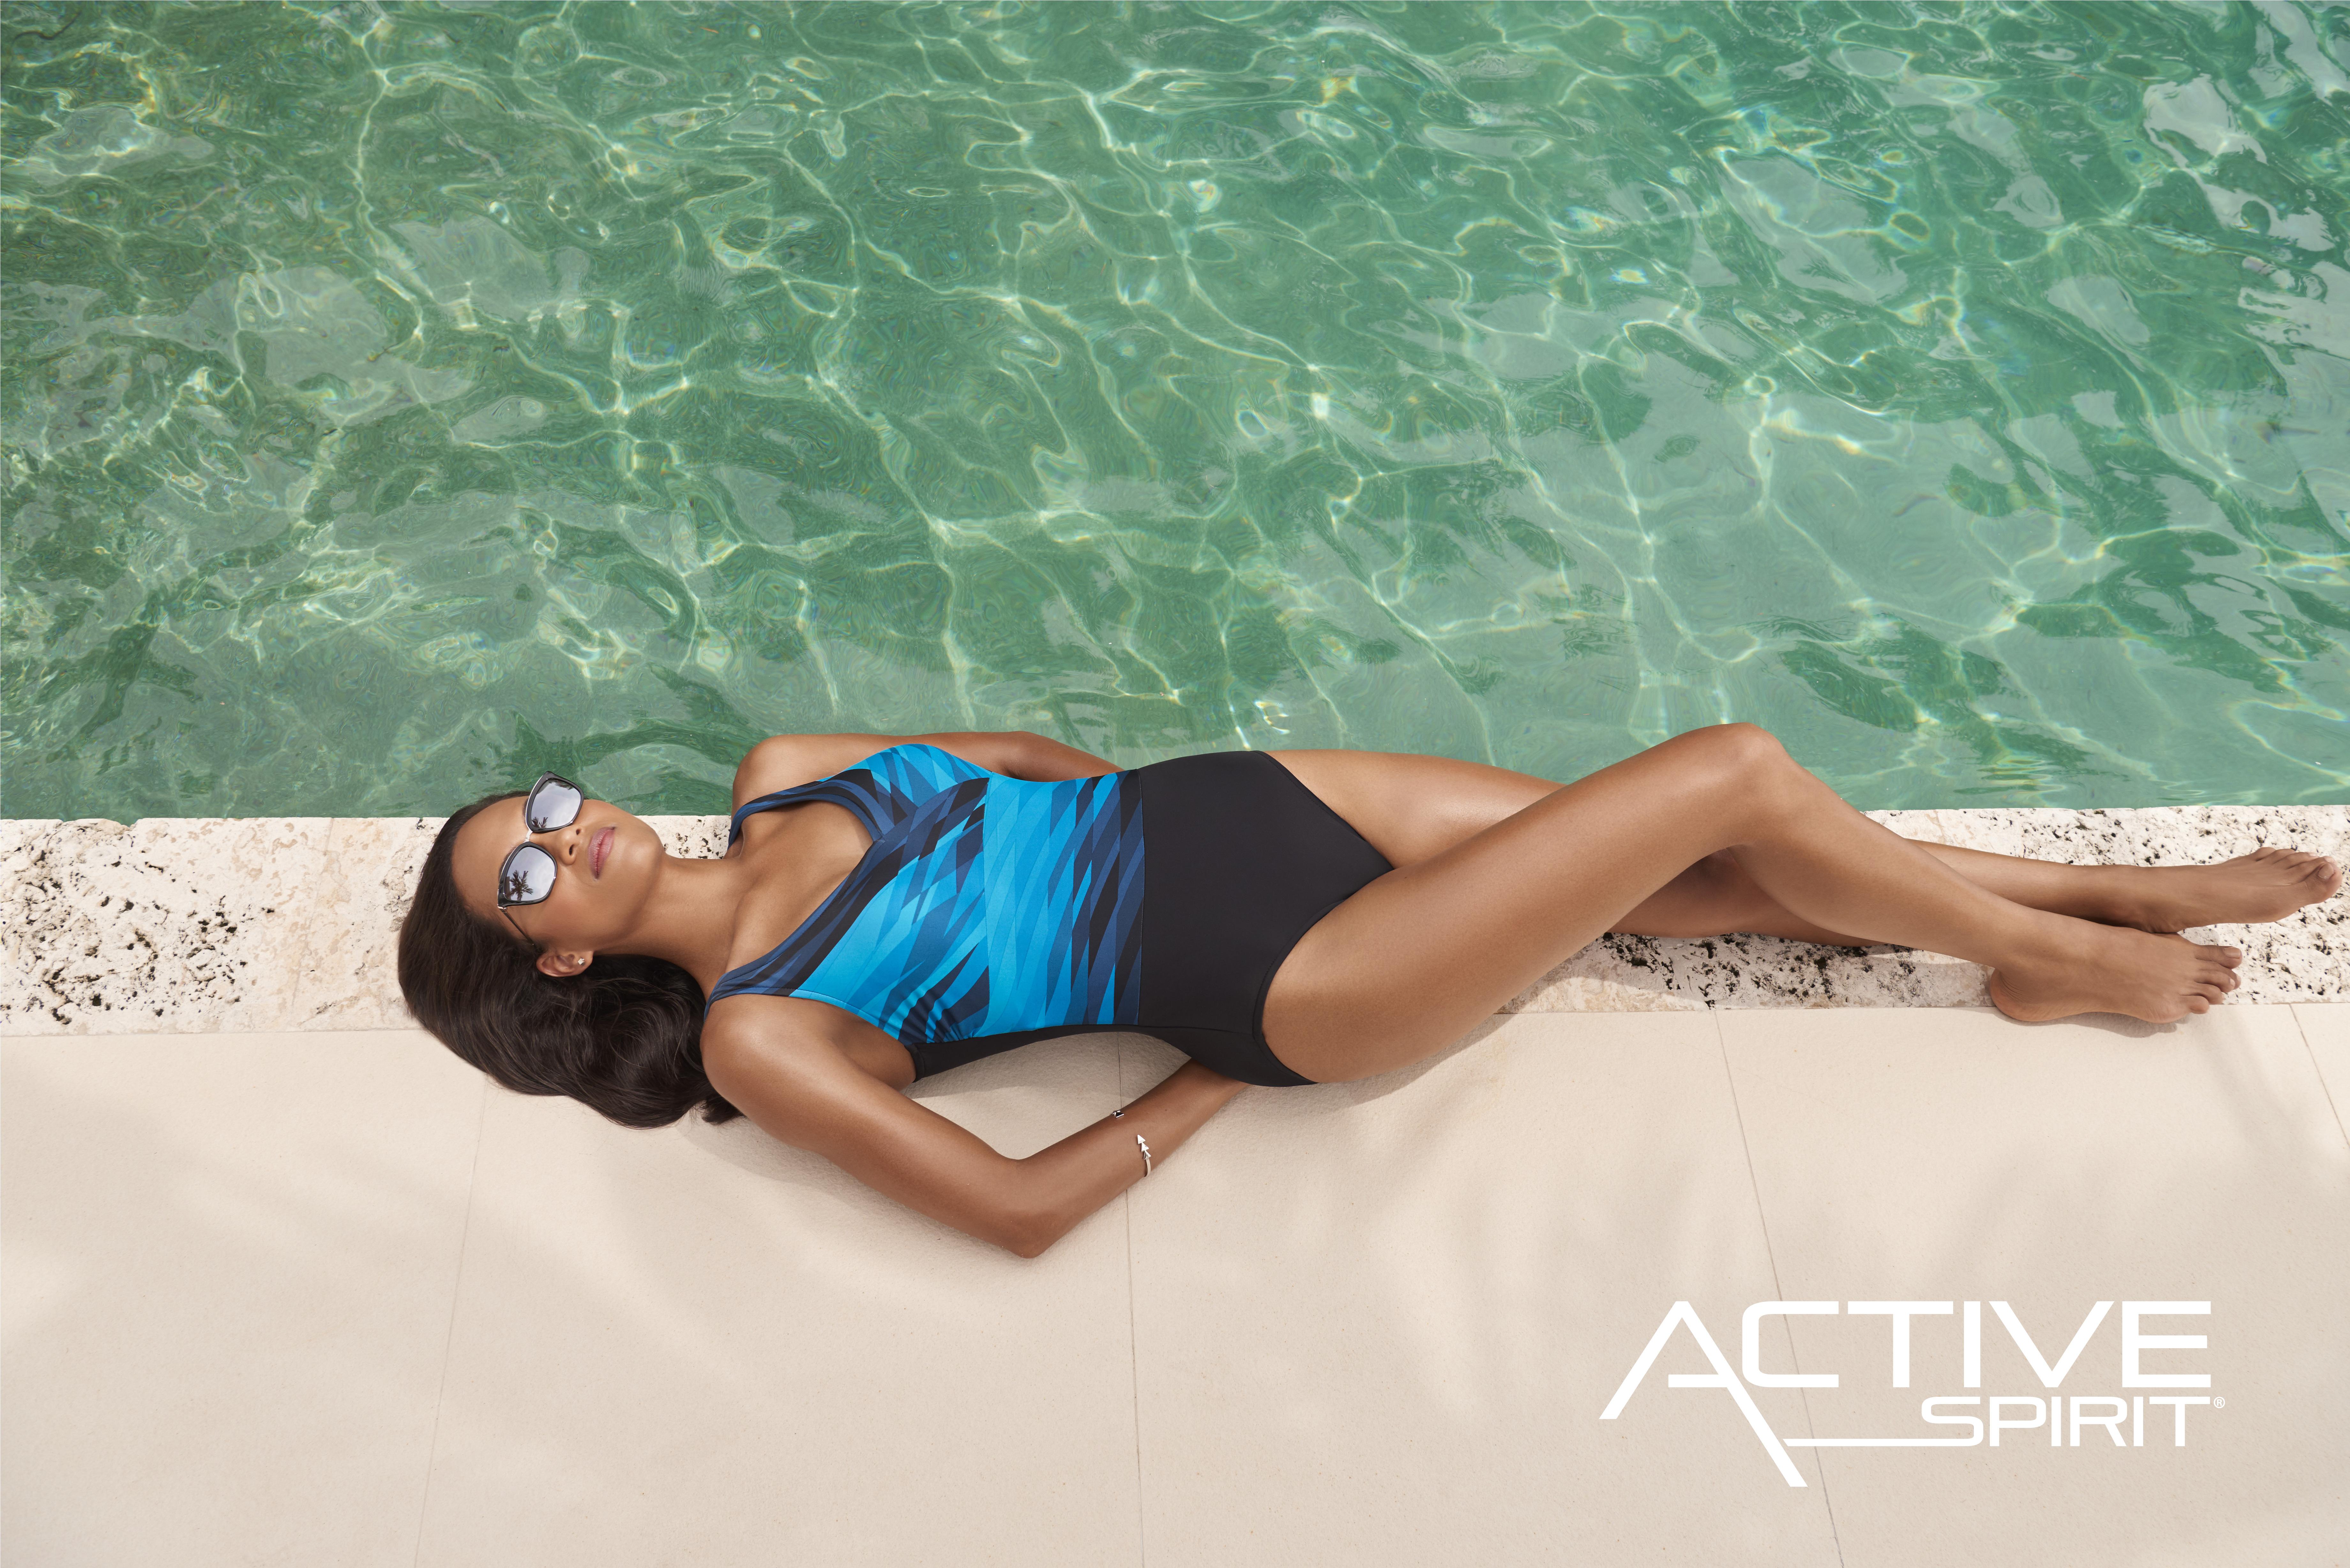 Active Spirit Swimwear